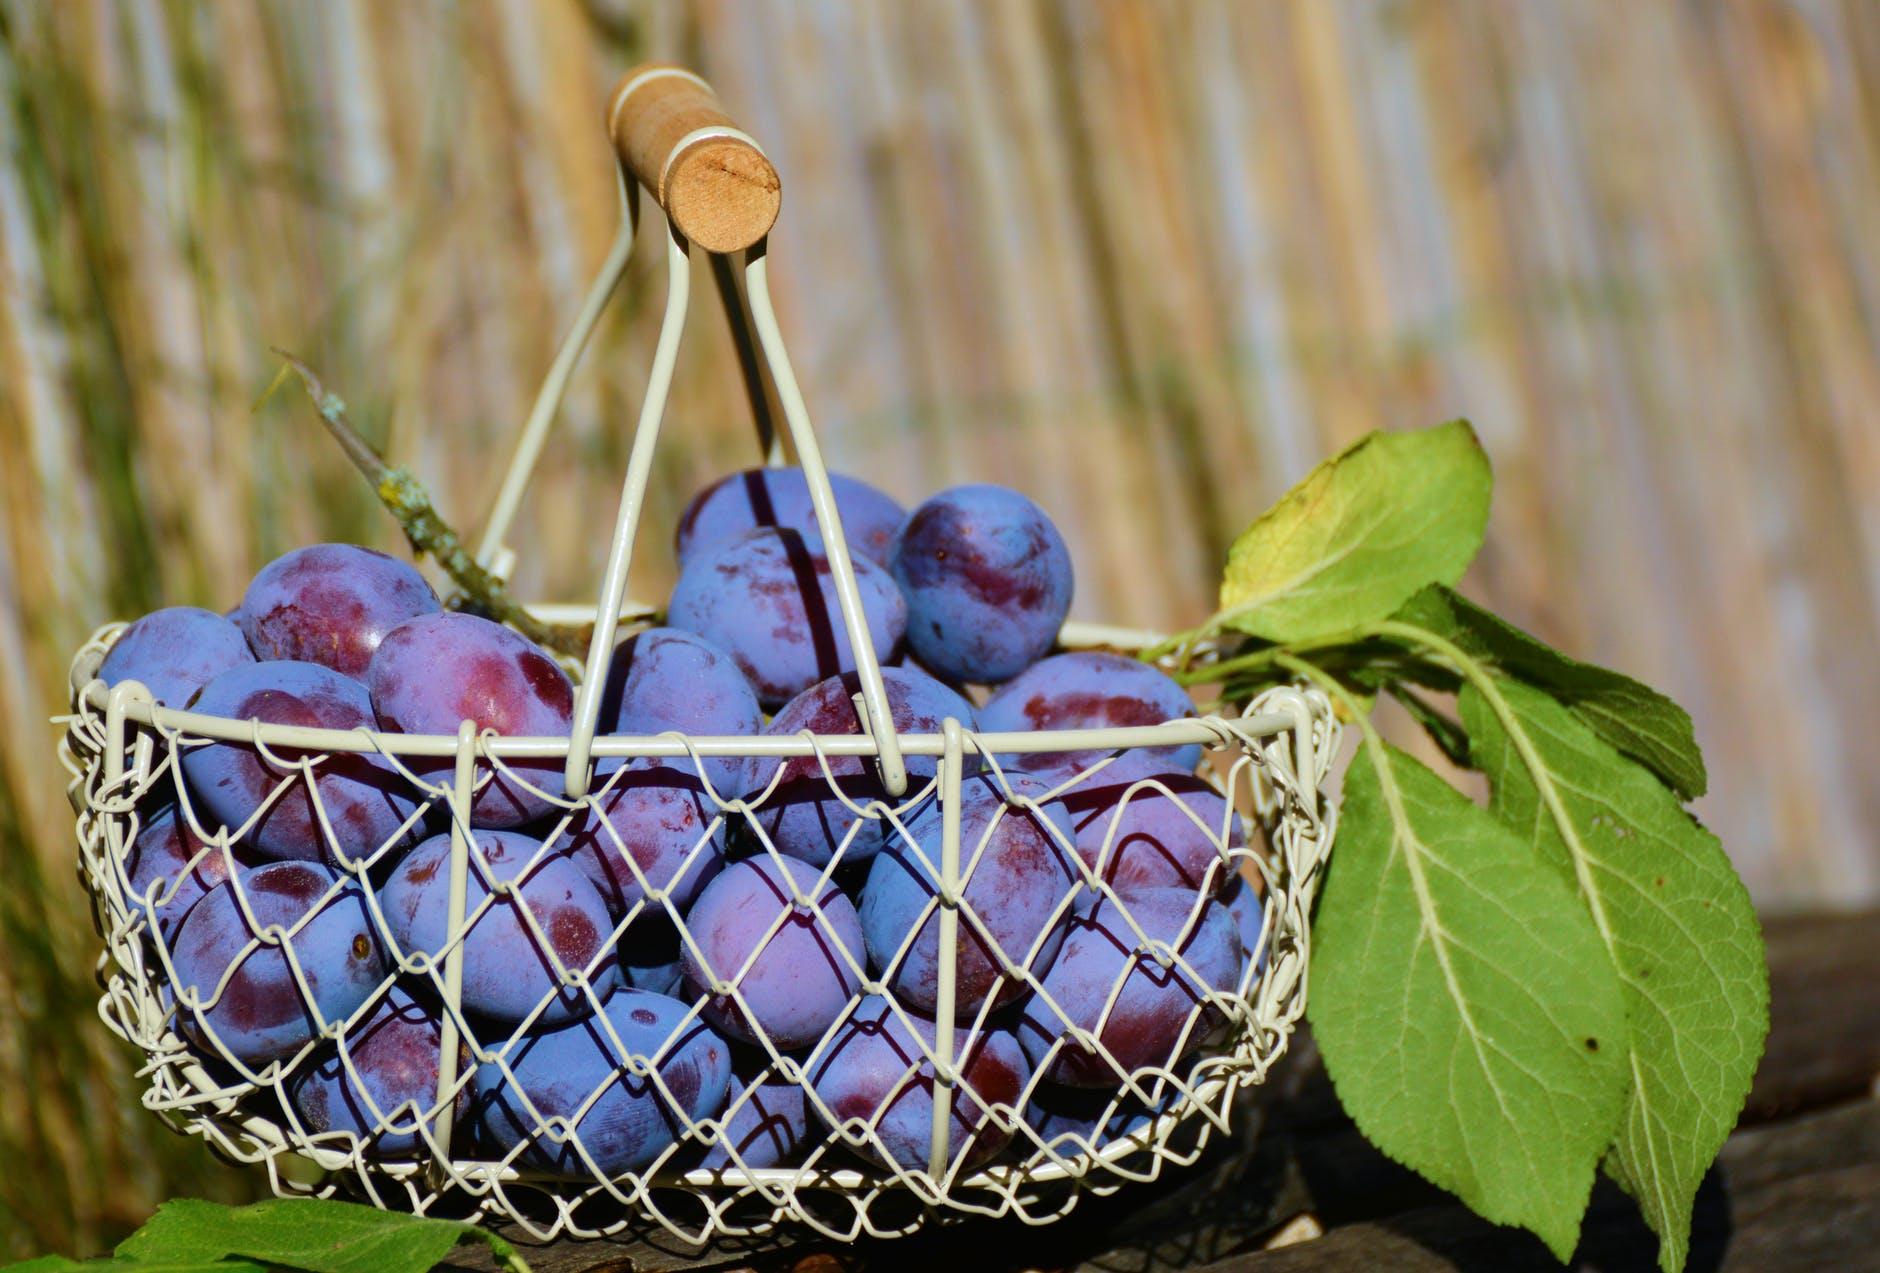 Blueberries Benefits